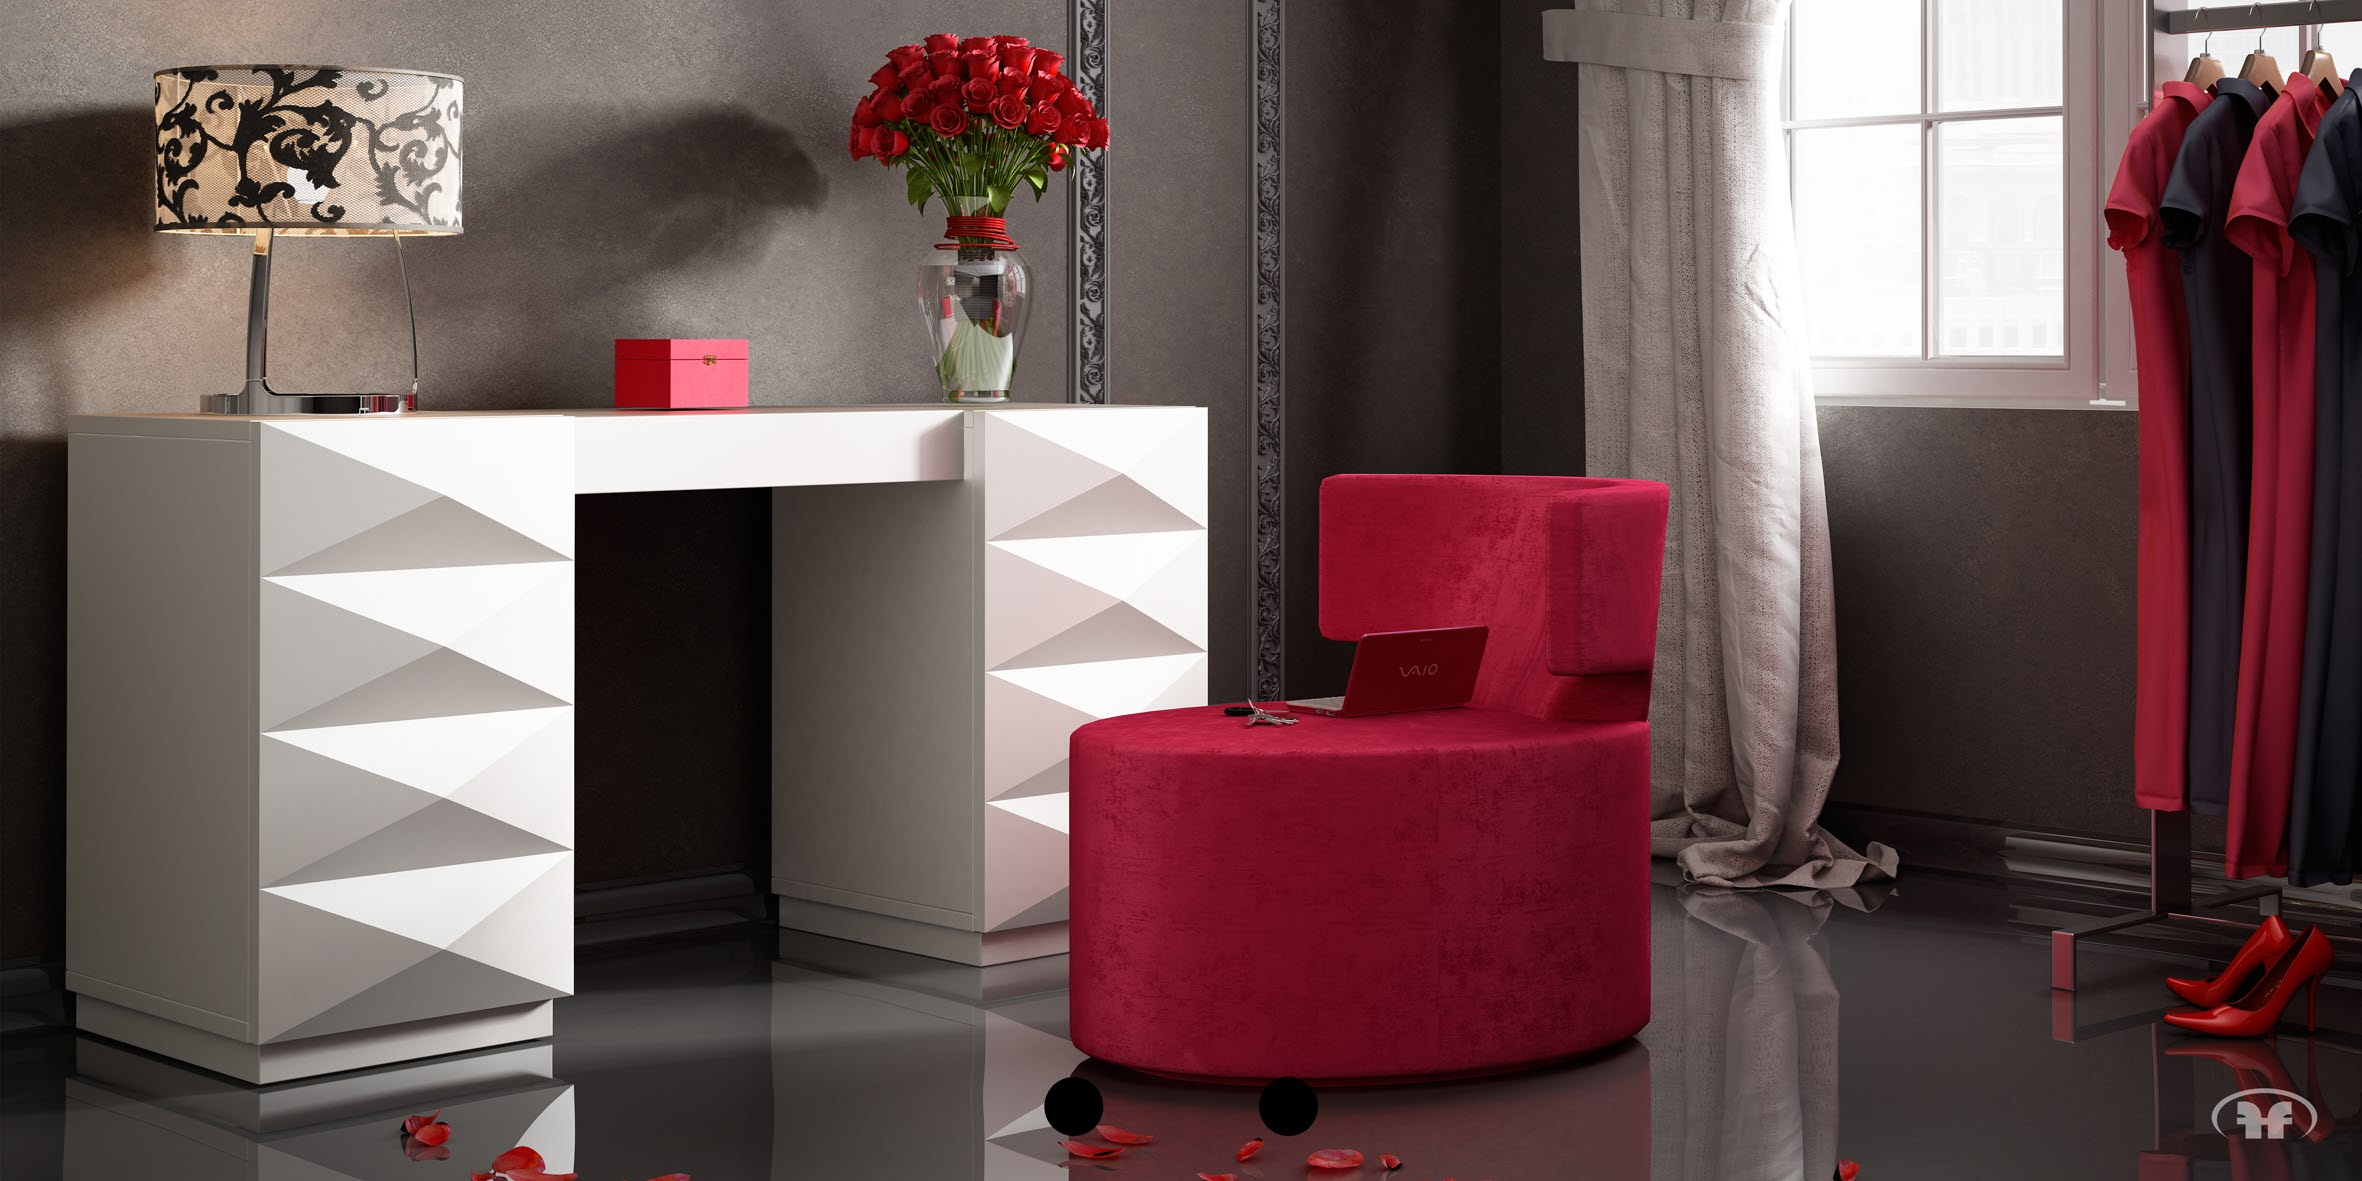 tocadores-Franco-muebles-paco-caballero-1220-5caf4b4ec2022